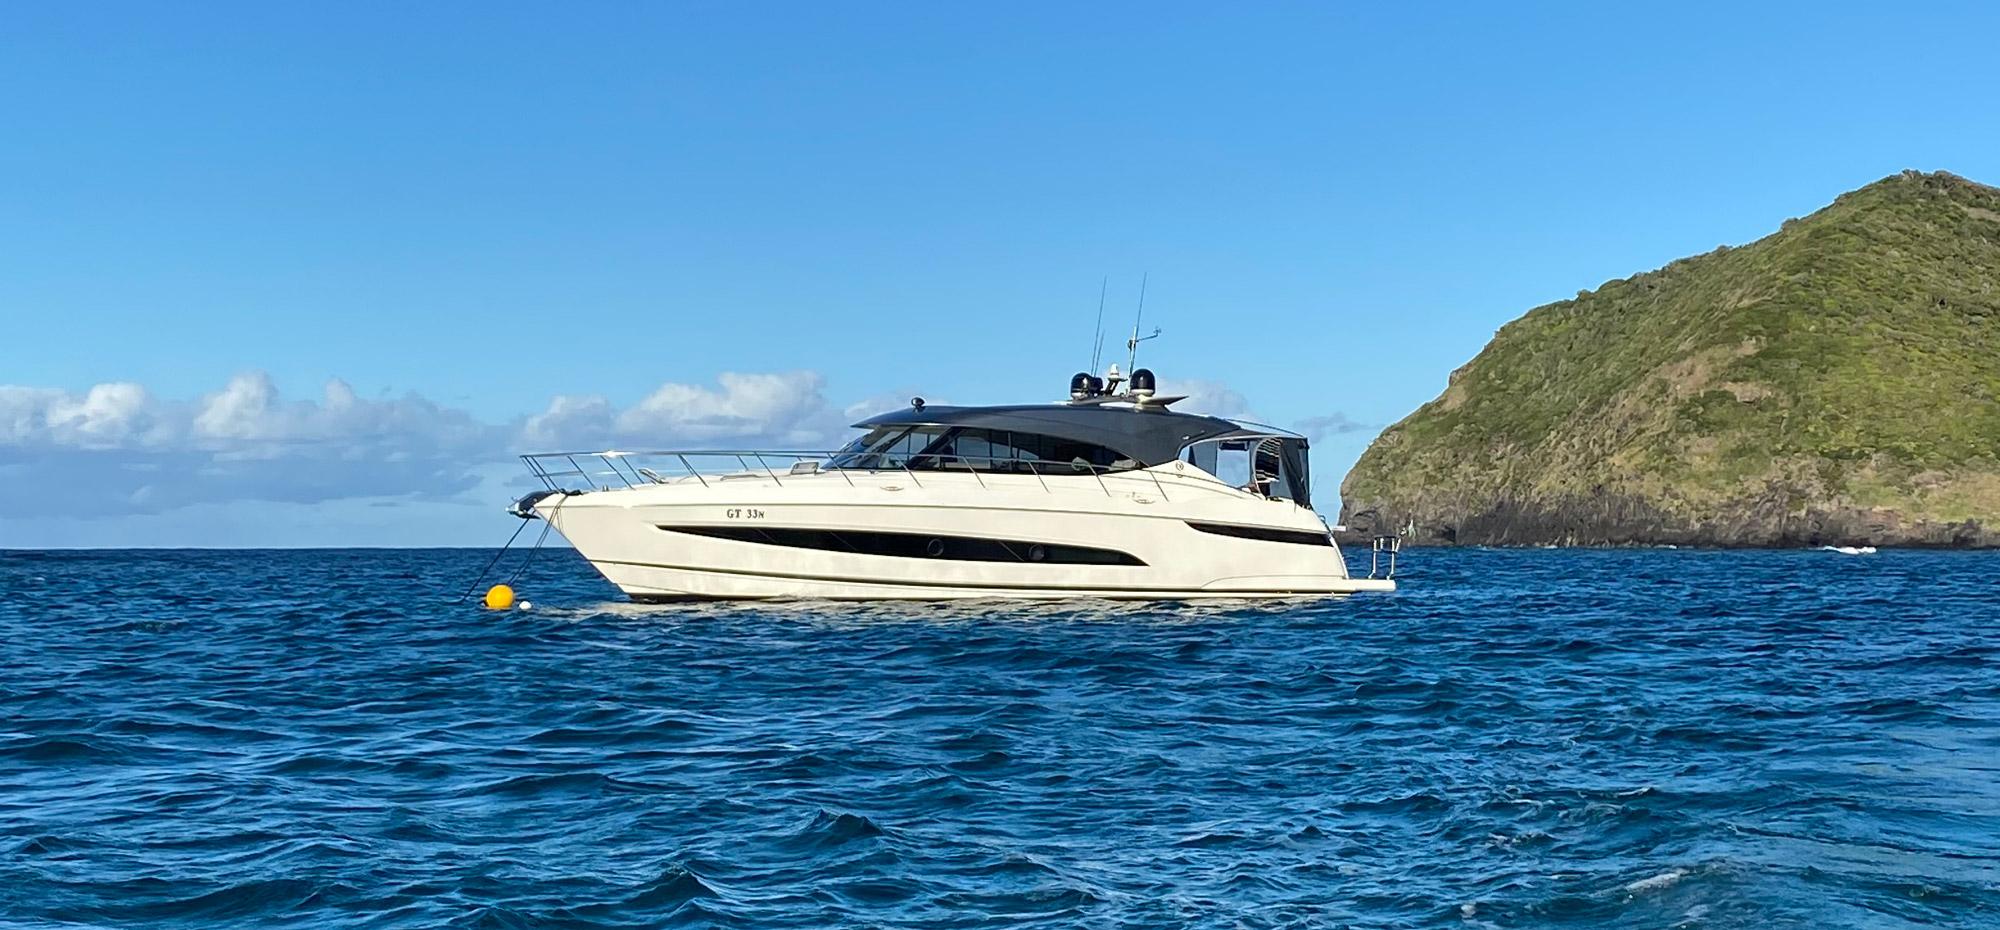 Riviera Boat anchored at Lord Howe